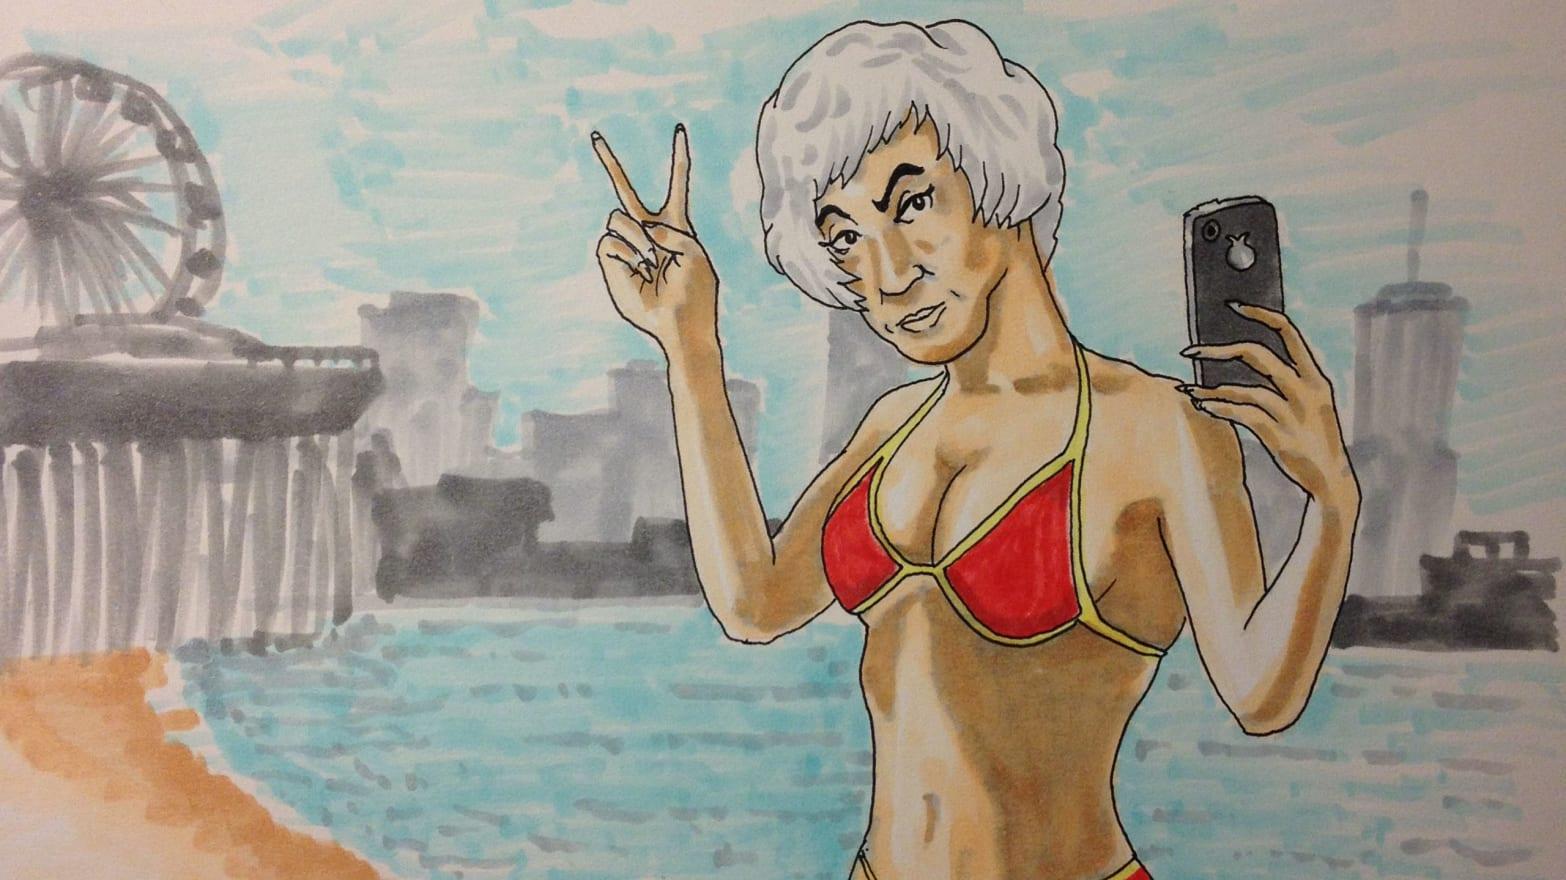 Bea arthur nude painting